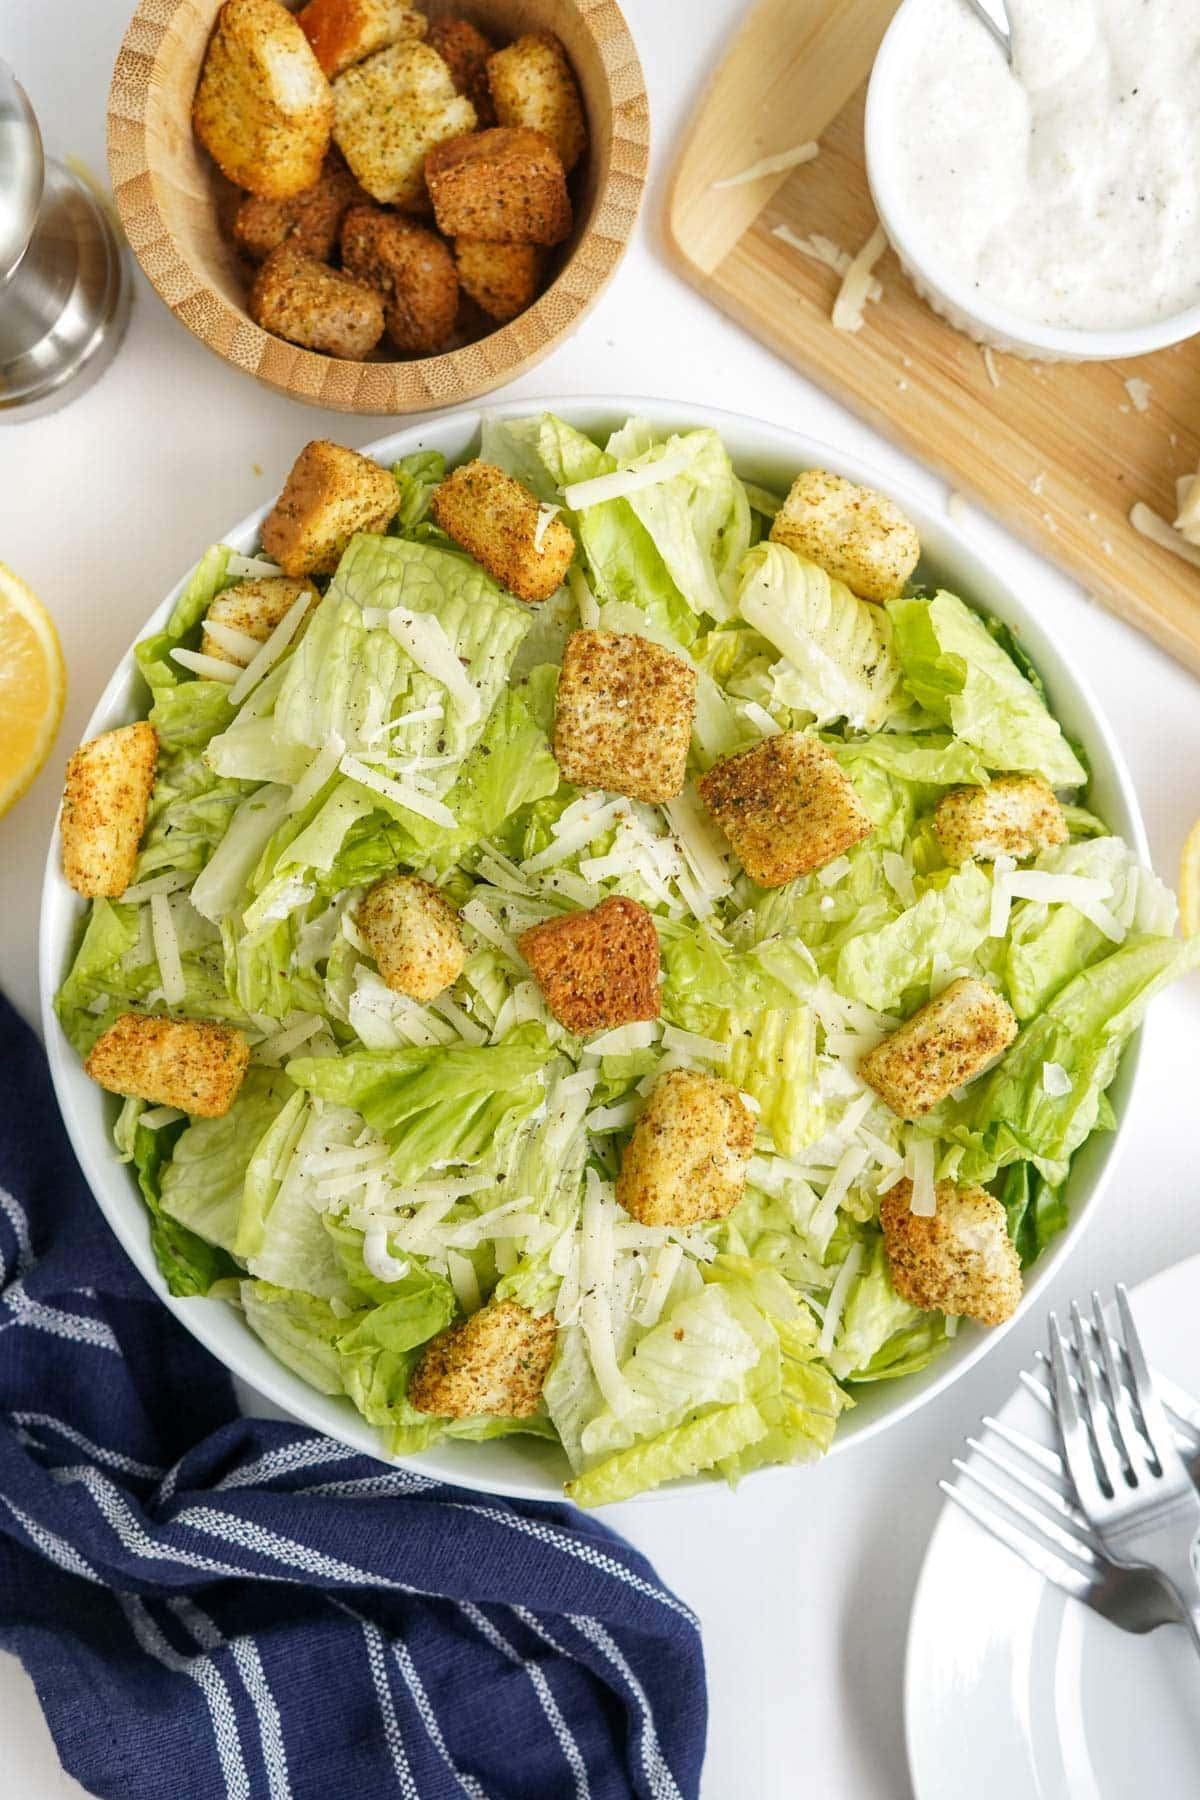 caesar salad in a white bowl